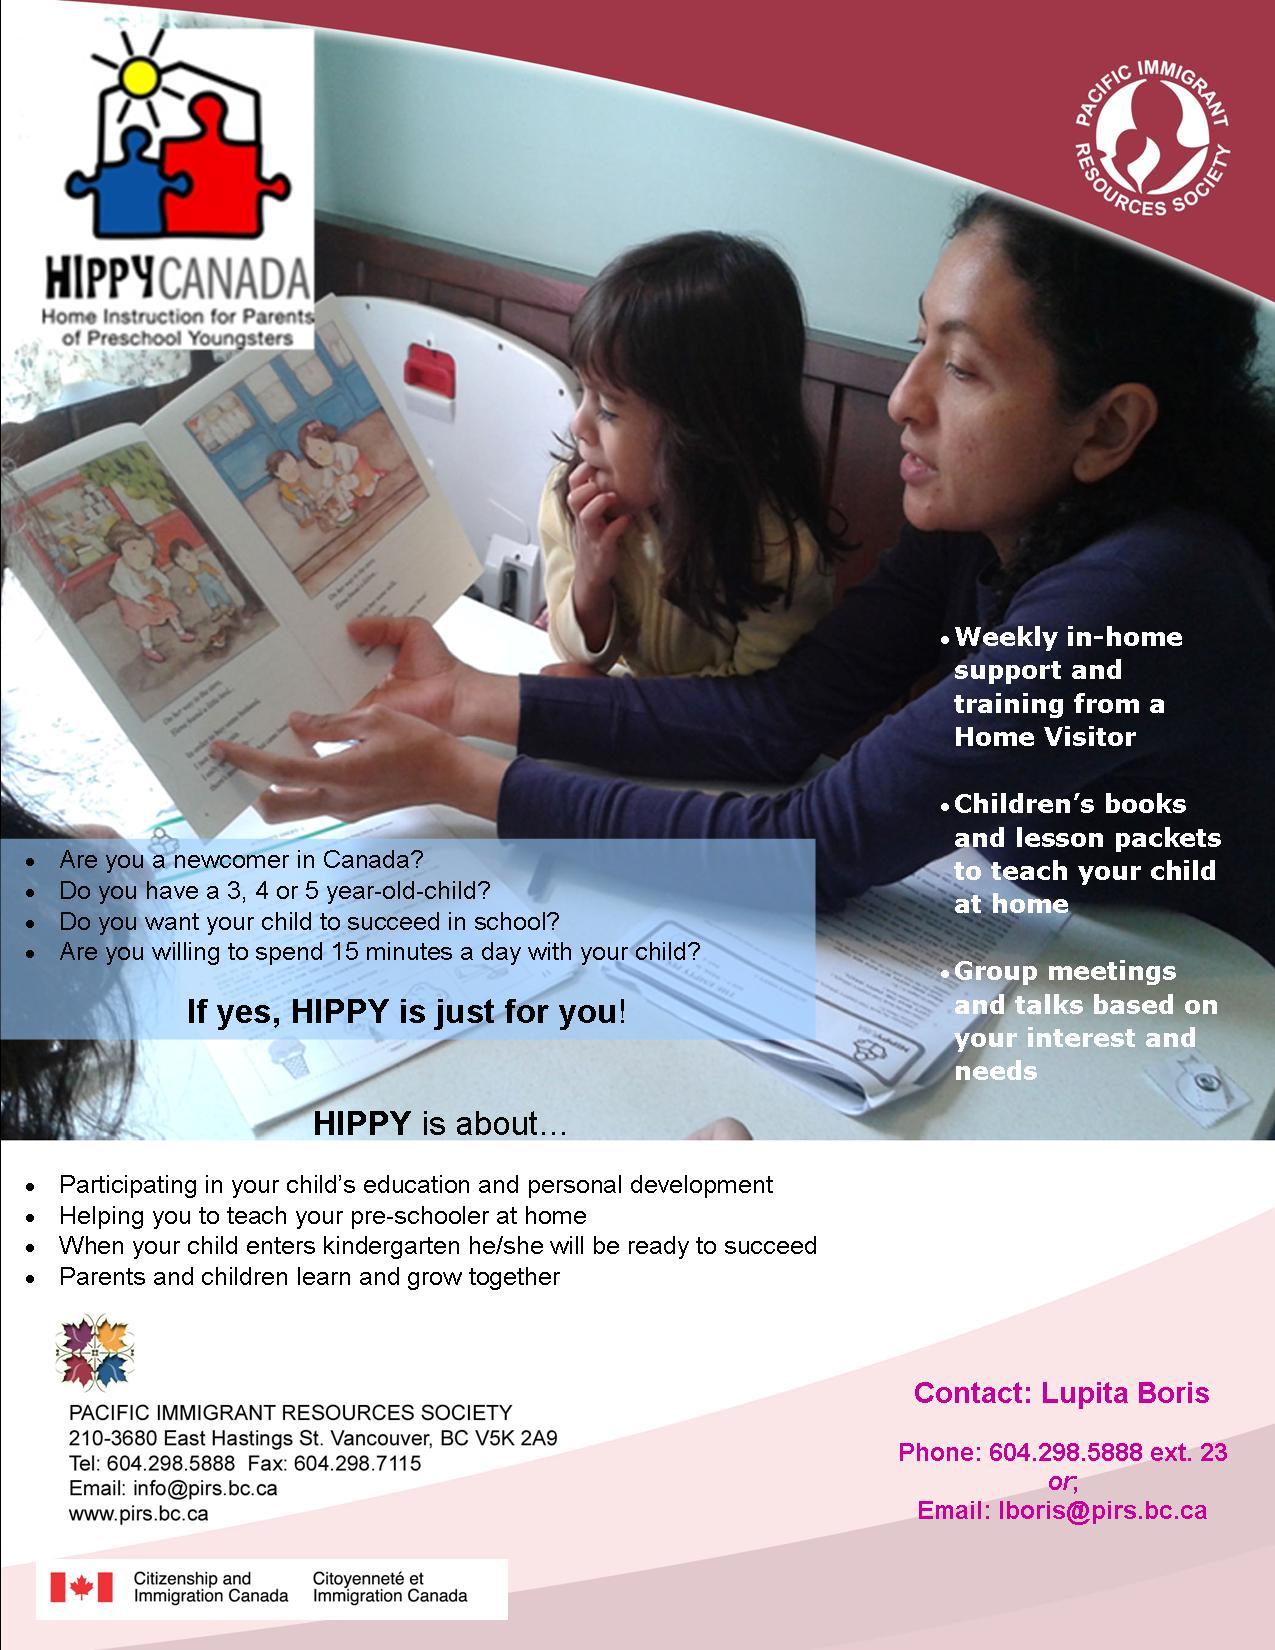 HIPPY Promotional